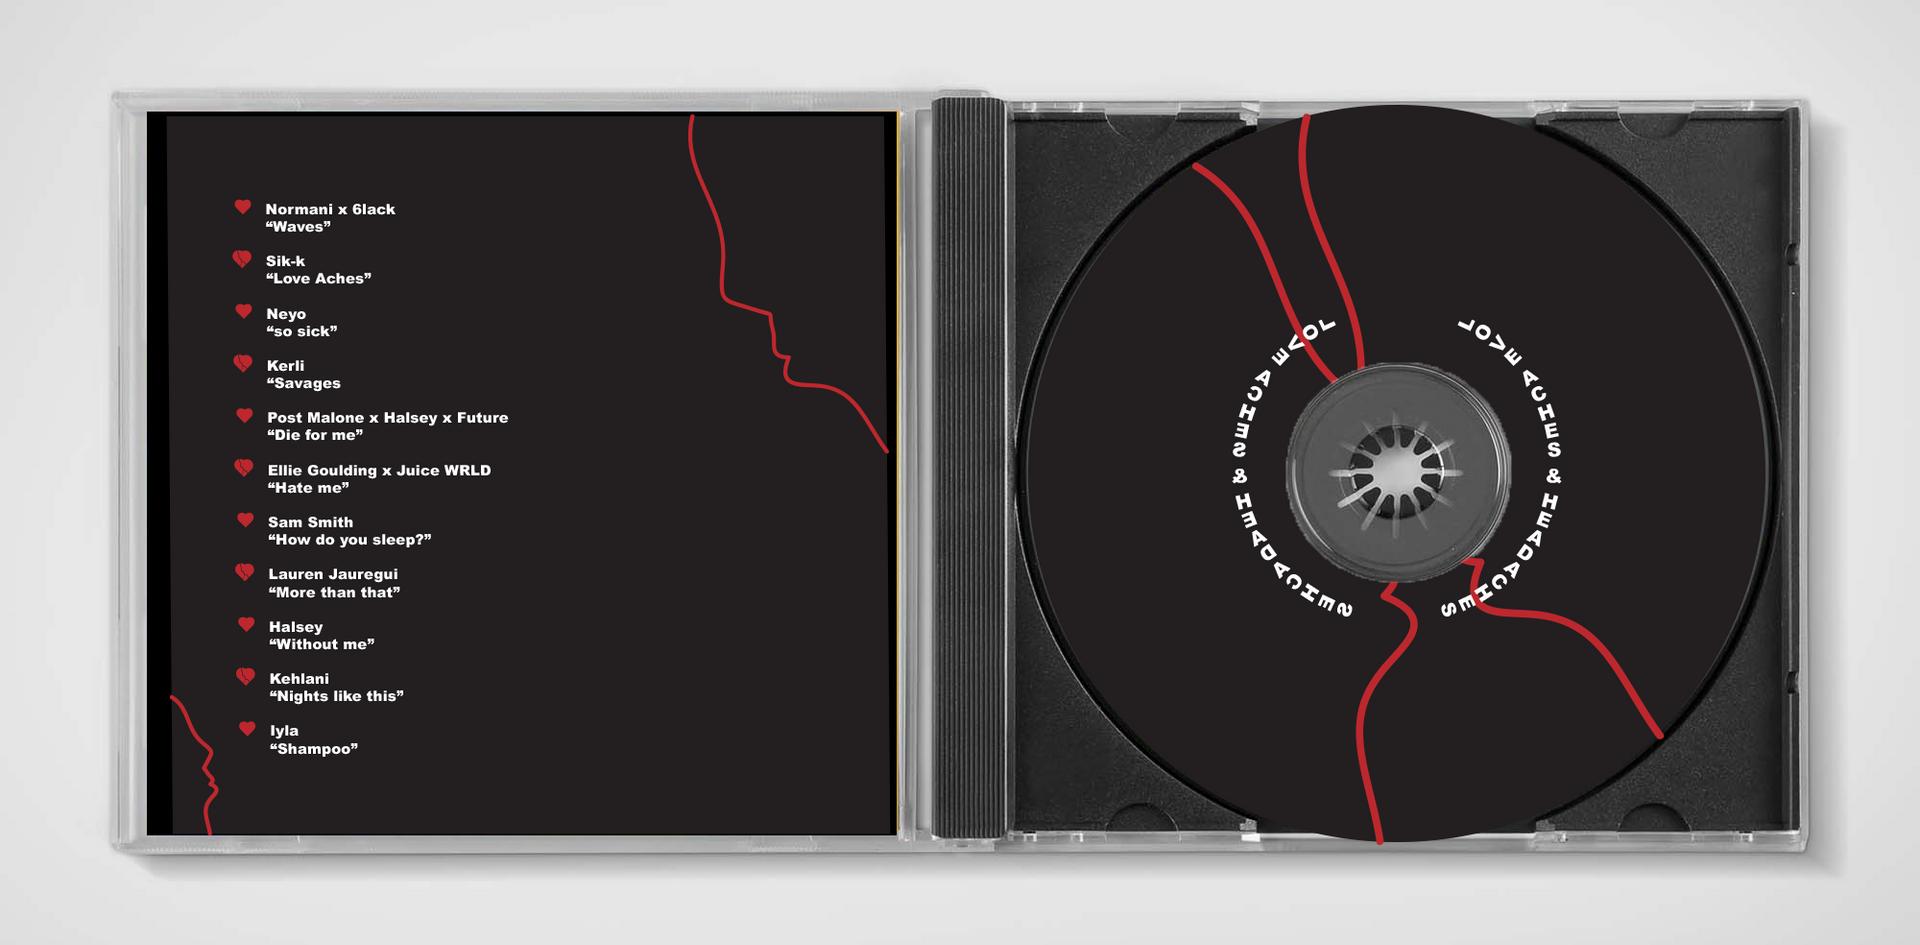 Loveaches and headaches cd interior.png